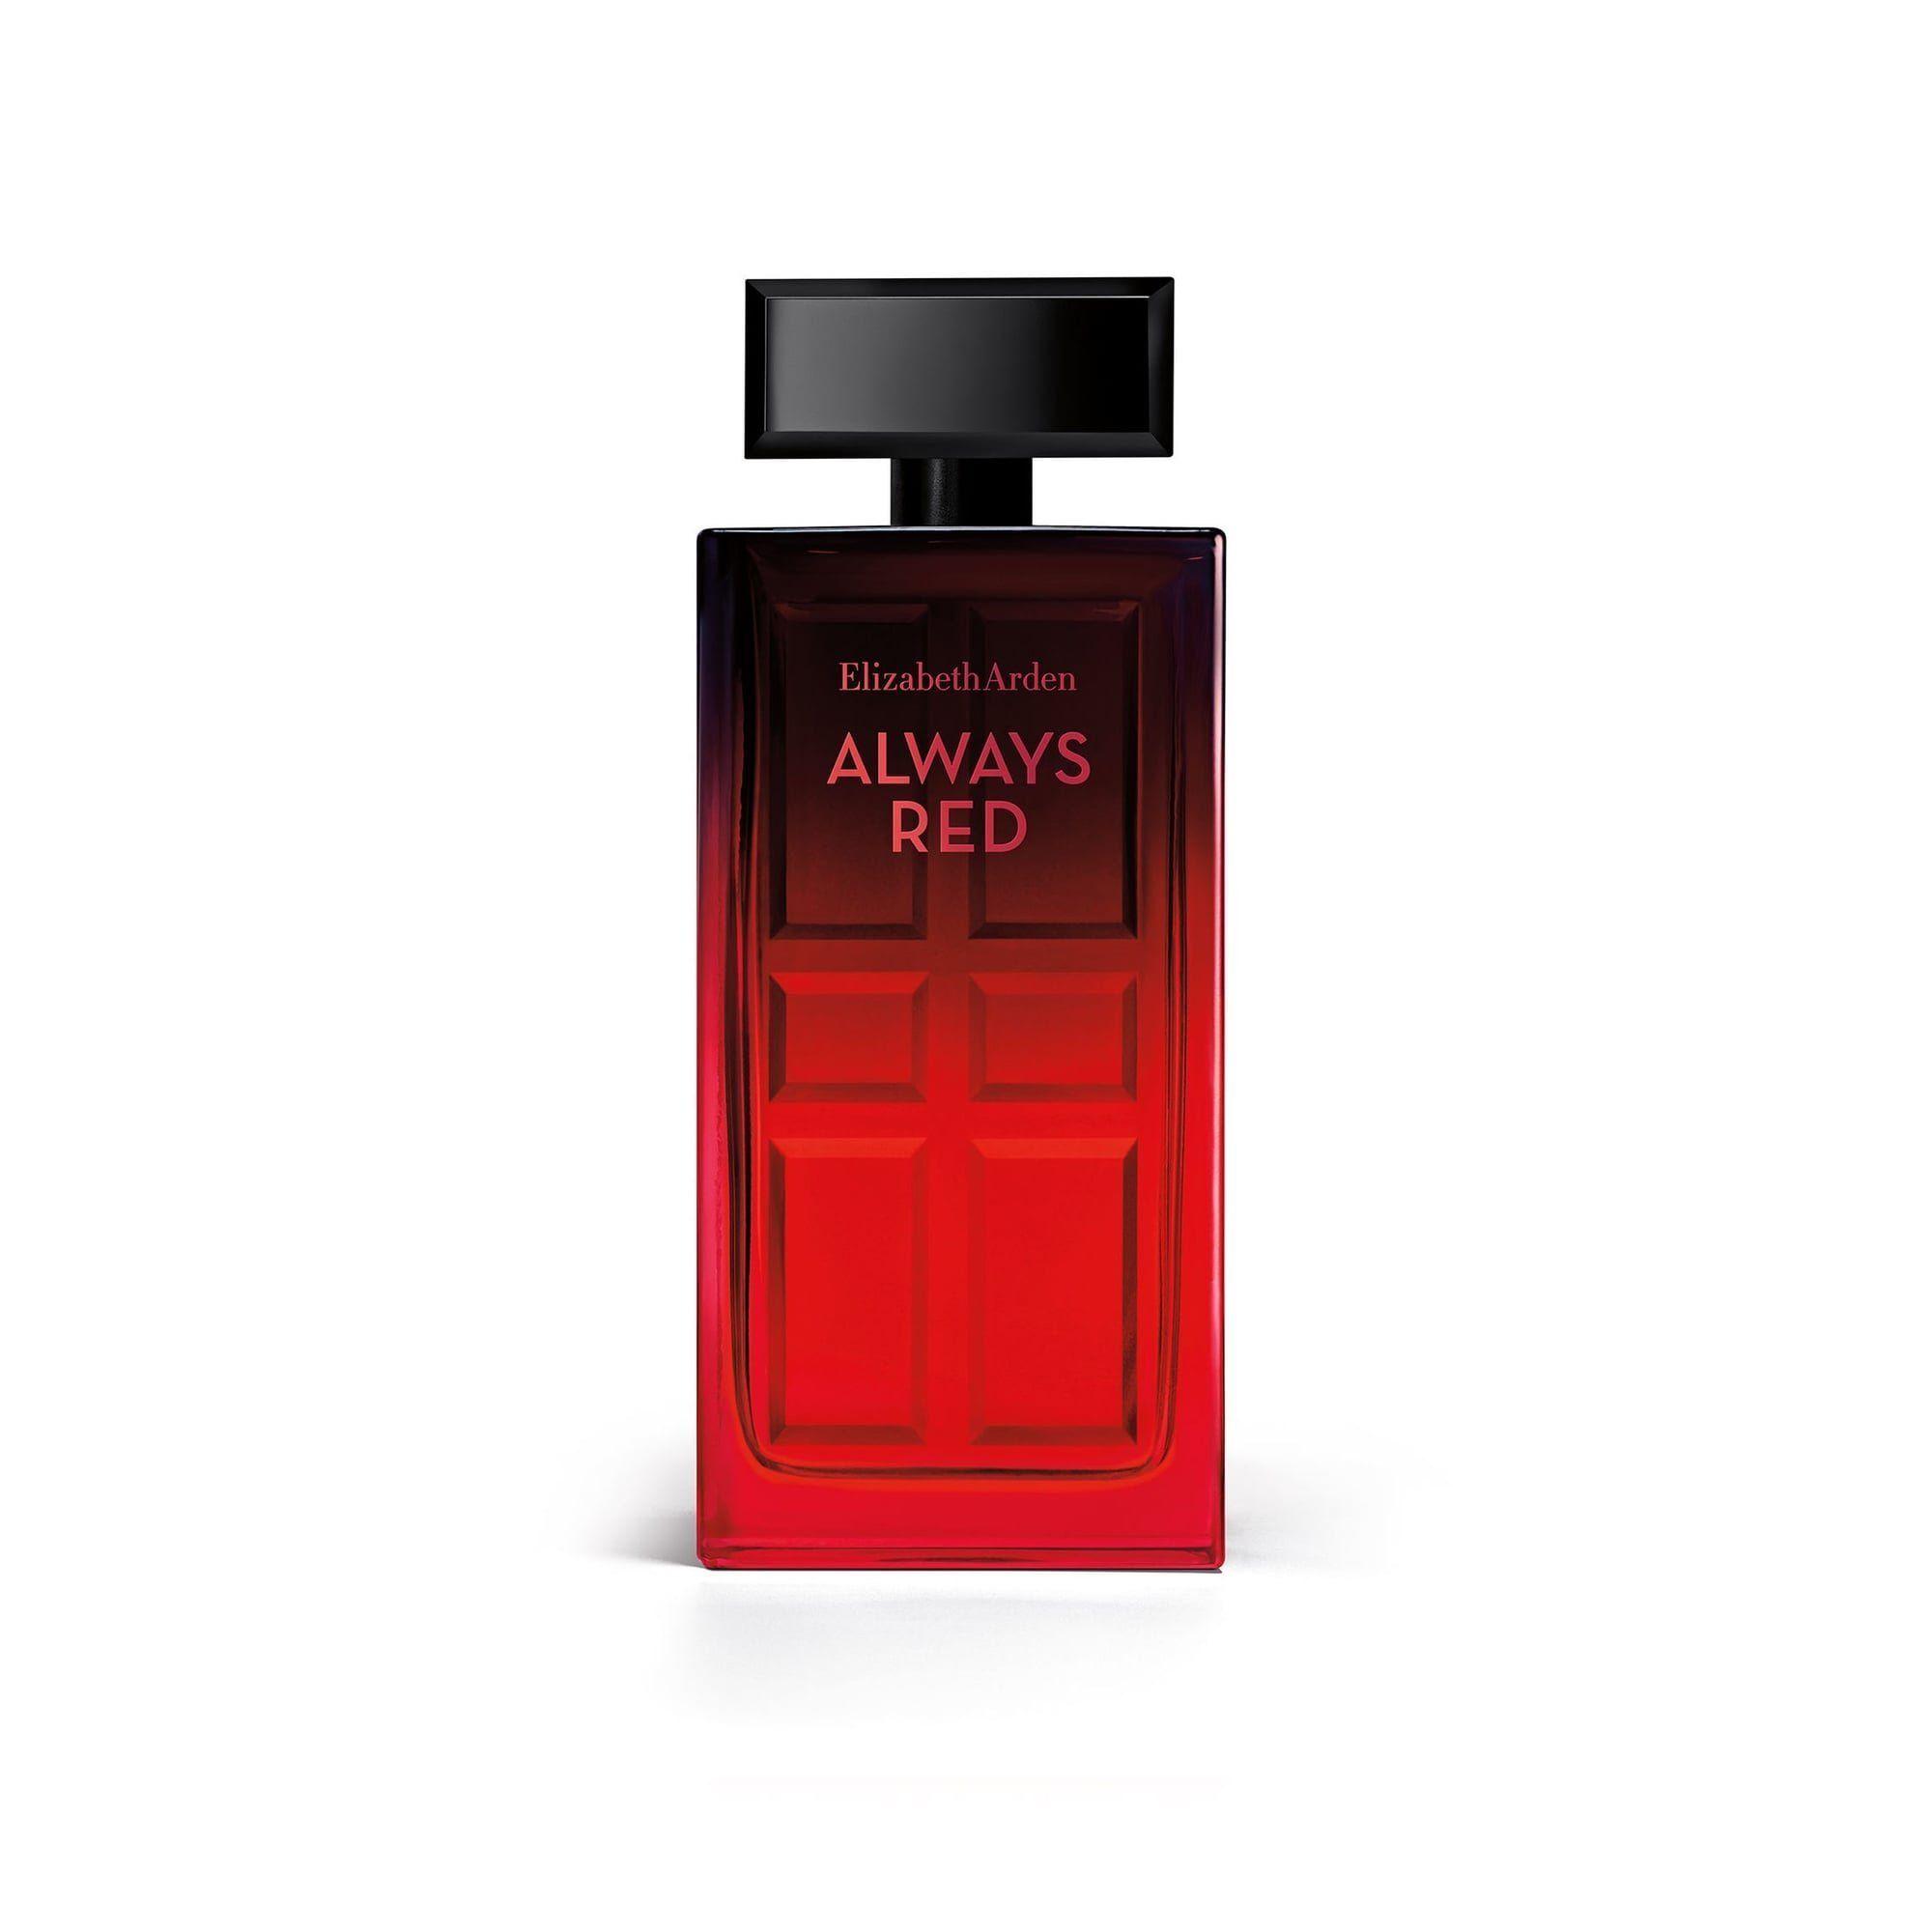 13 89 Elizabeth Arden Red Porte Anno Di Fabbricazione Always Red